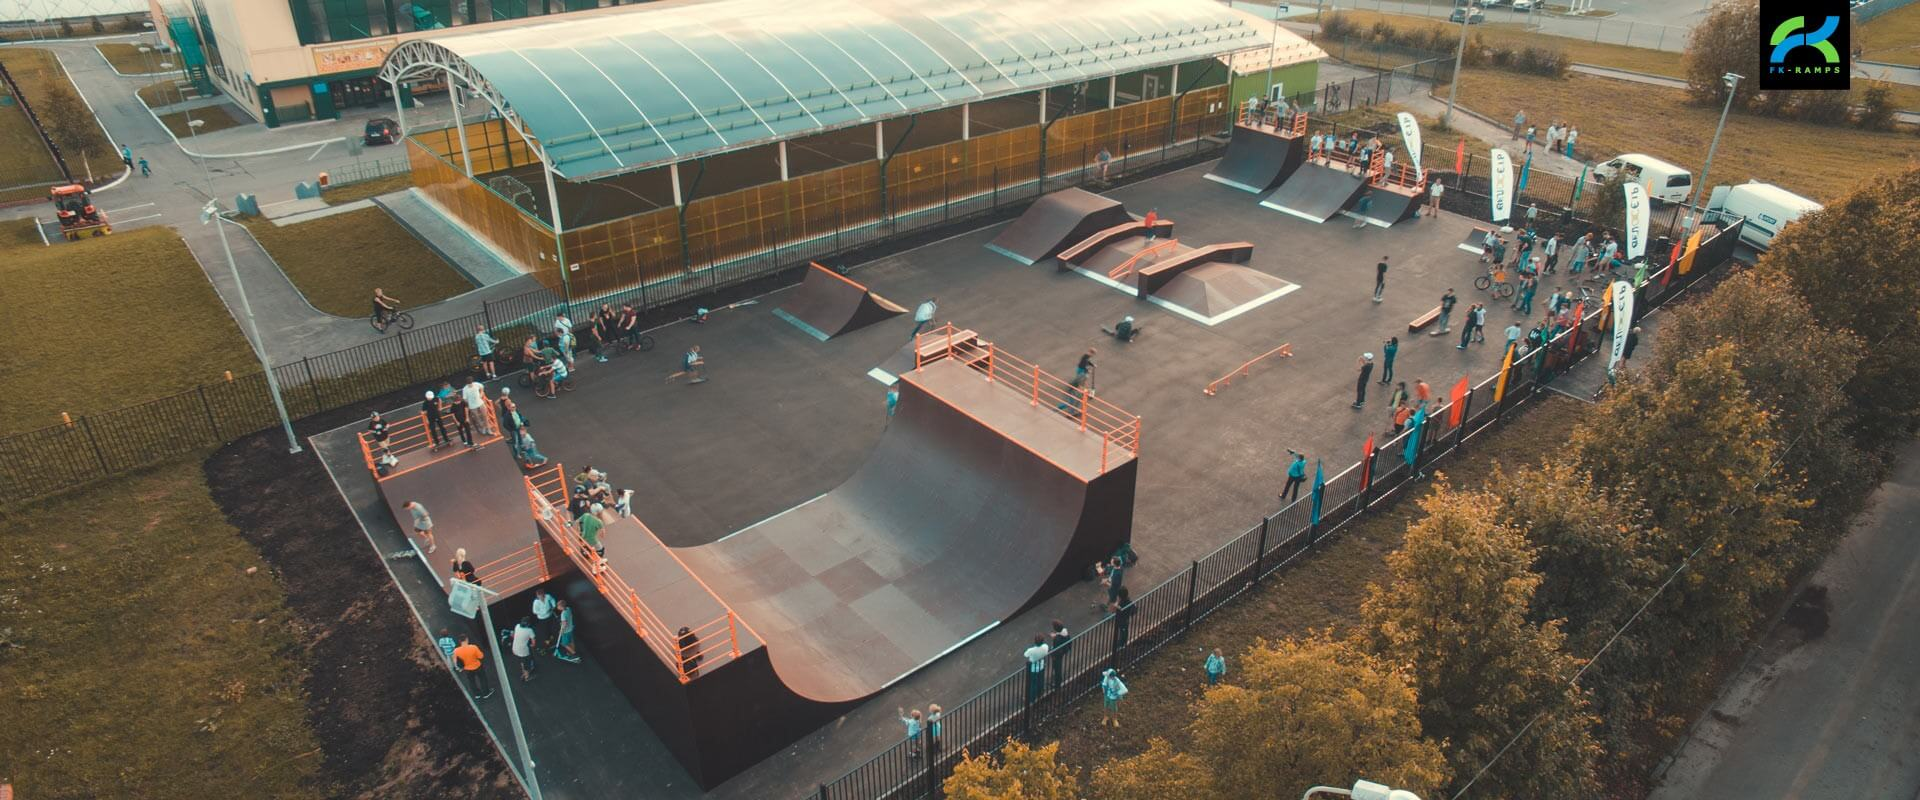 Скейт парки для архитекторных организаций - FK-ramps